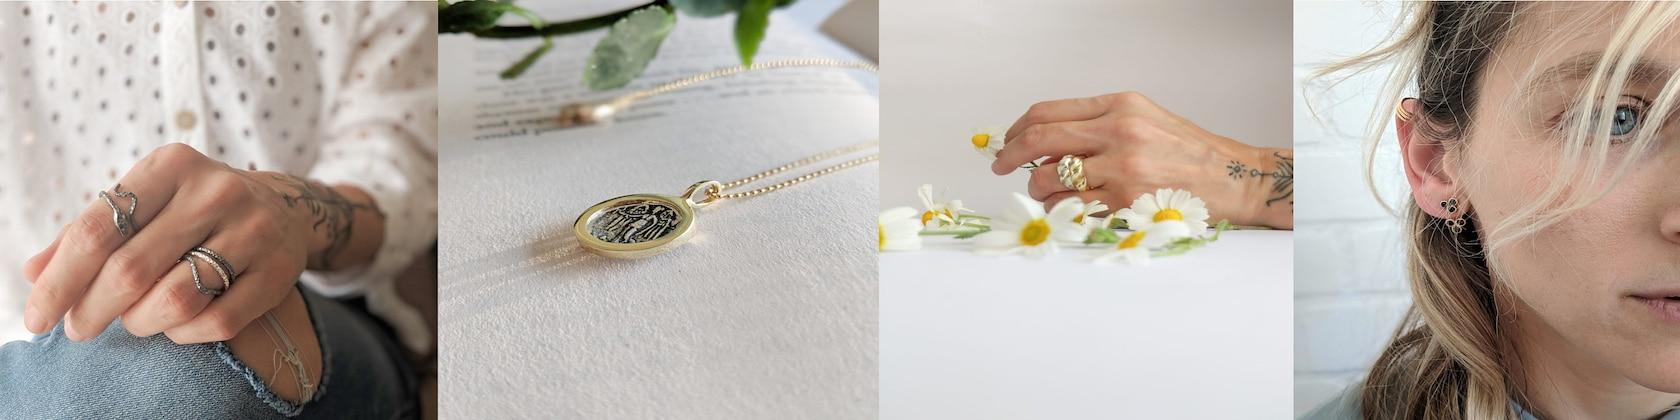 Jewelry Adviser Charms 14K Girl Head Charm